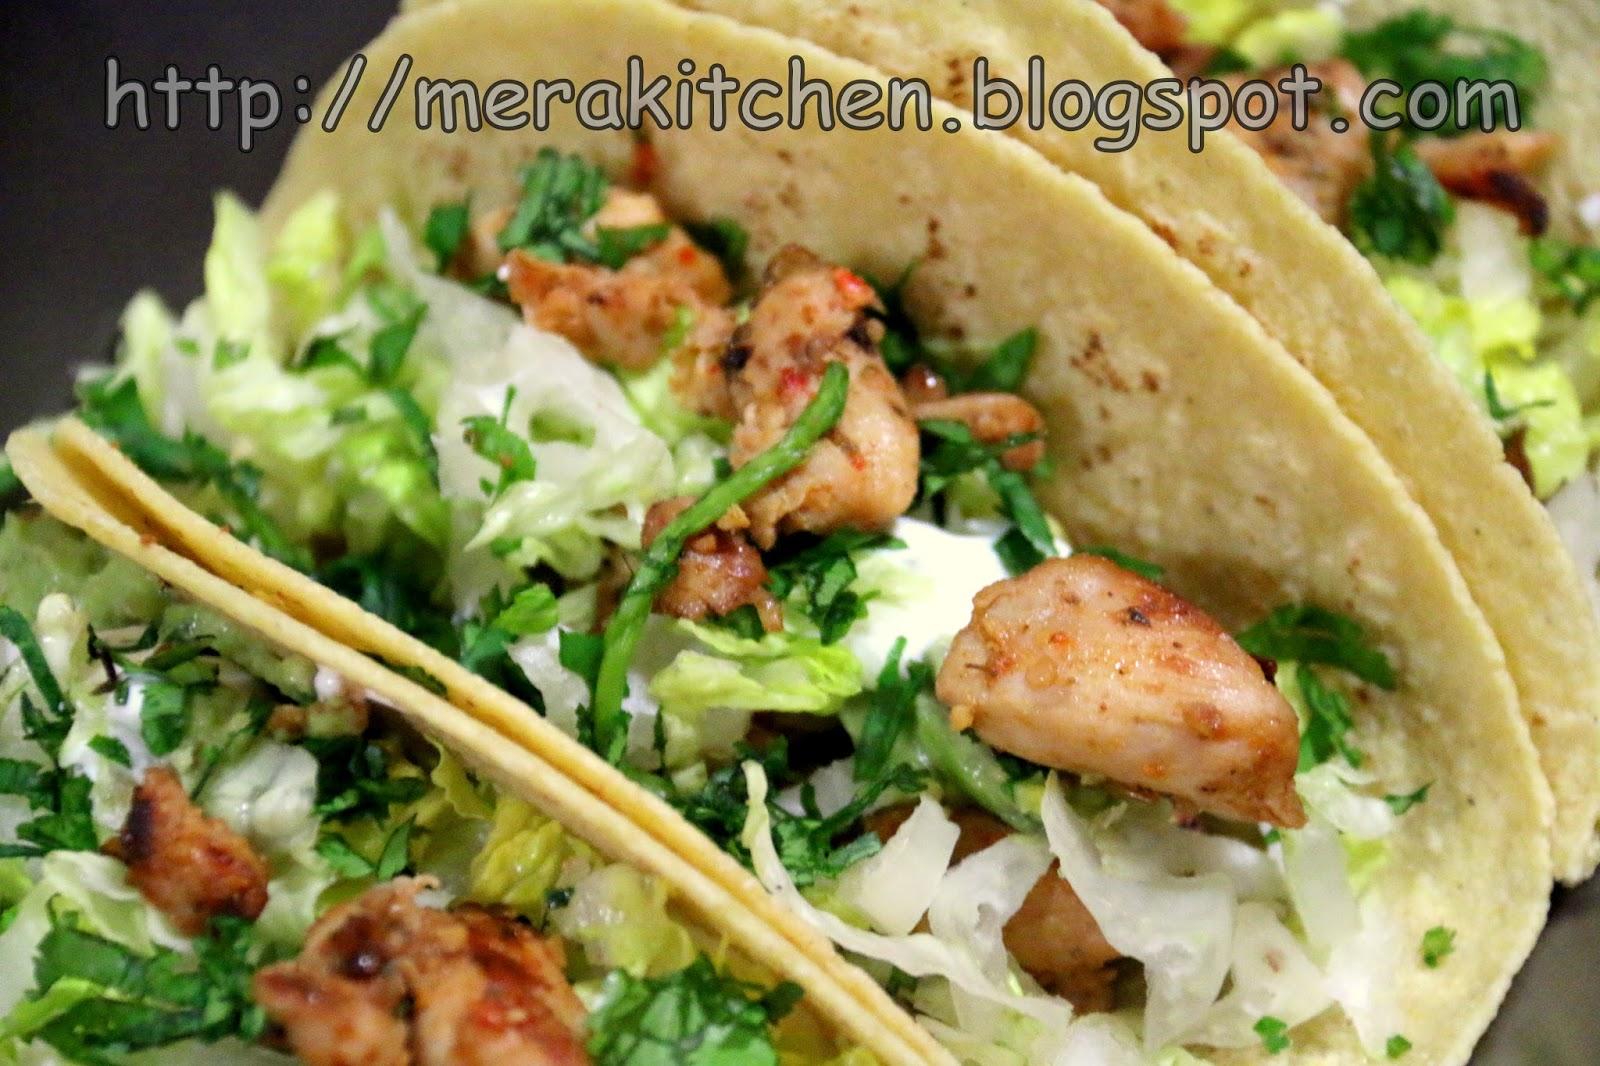 merakitchen: Simple Chicken Taco - #TacoTuesday #1